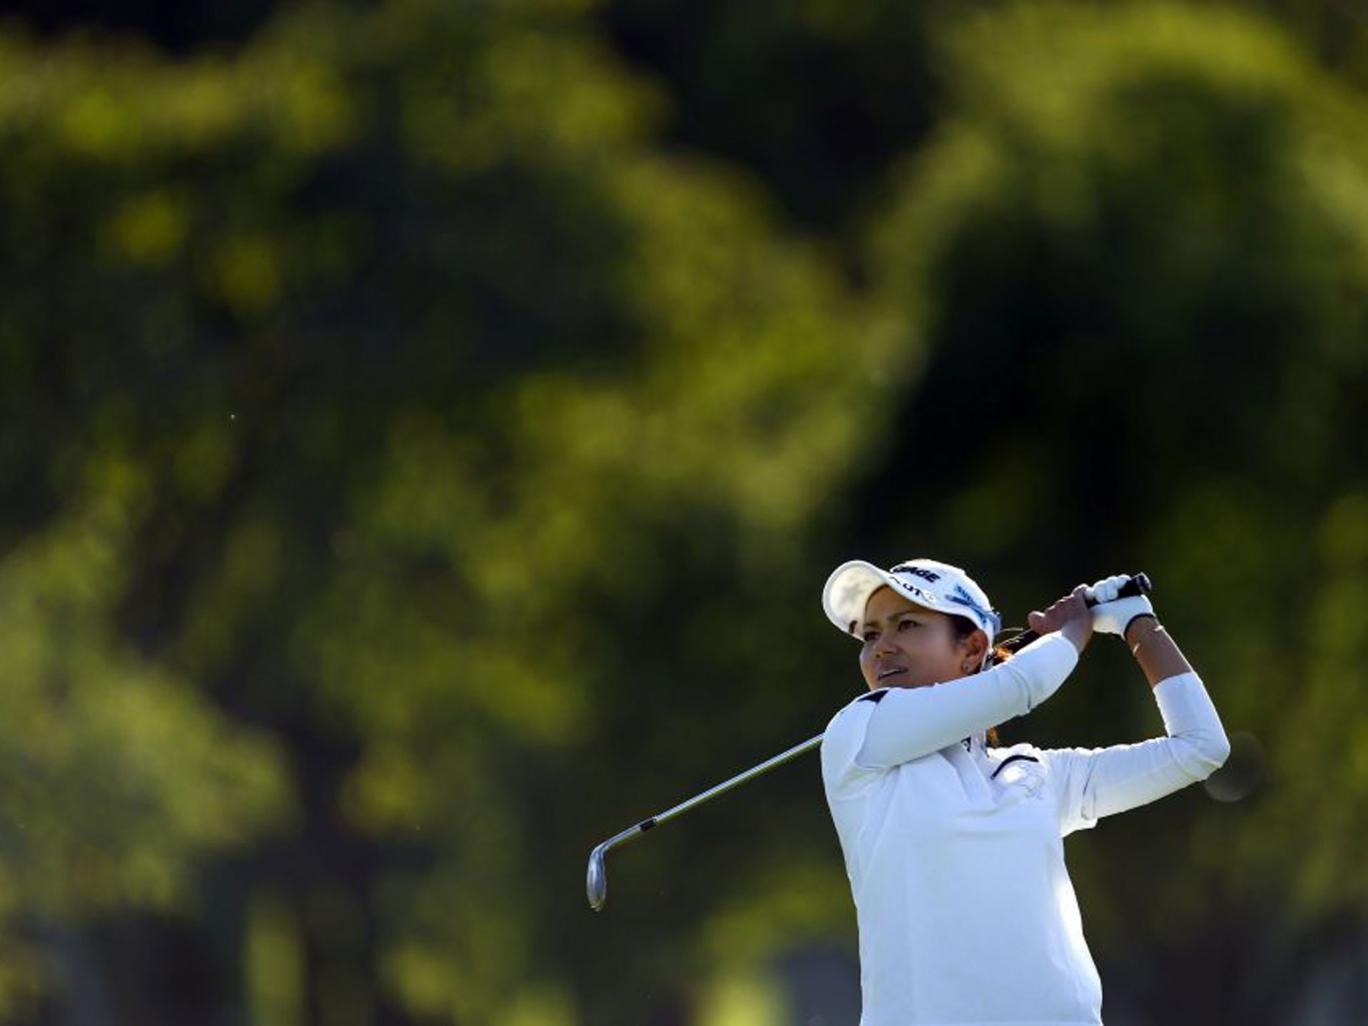 Japan's Mika Miyazato holds a one-shot lead over Sandra Gal